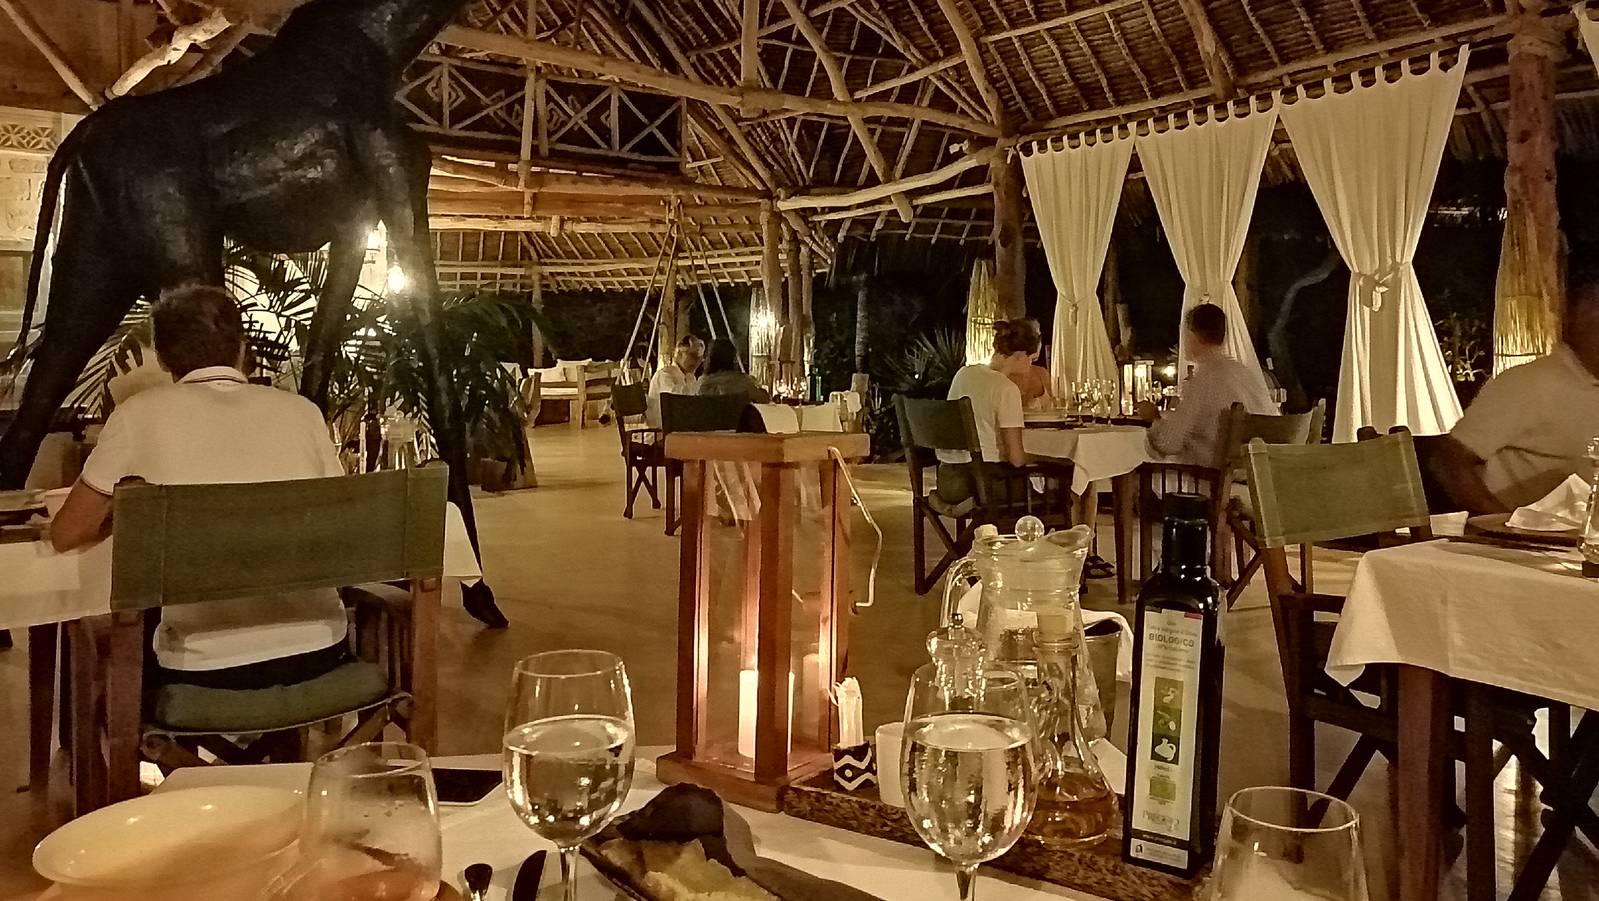 Lonno Lodge restaurant at dinner time